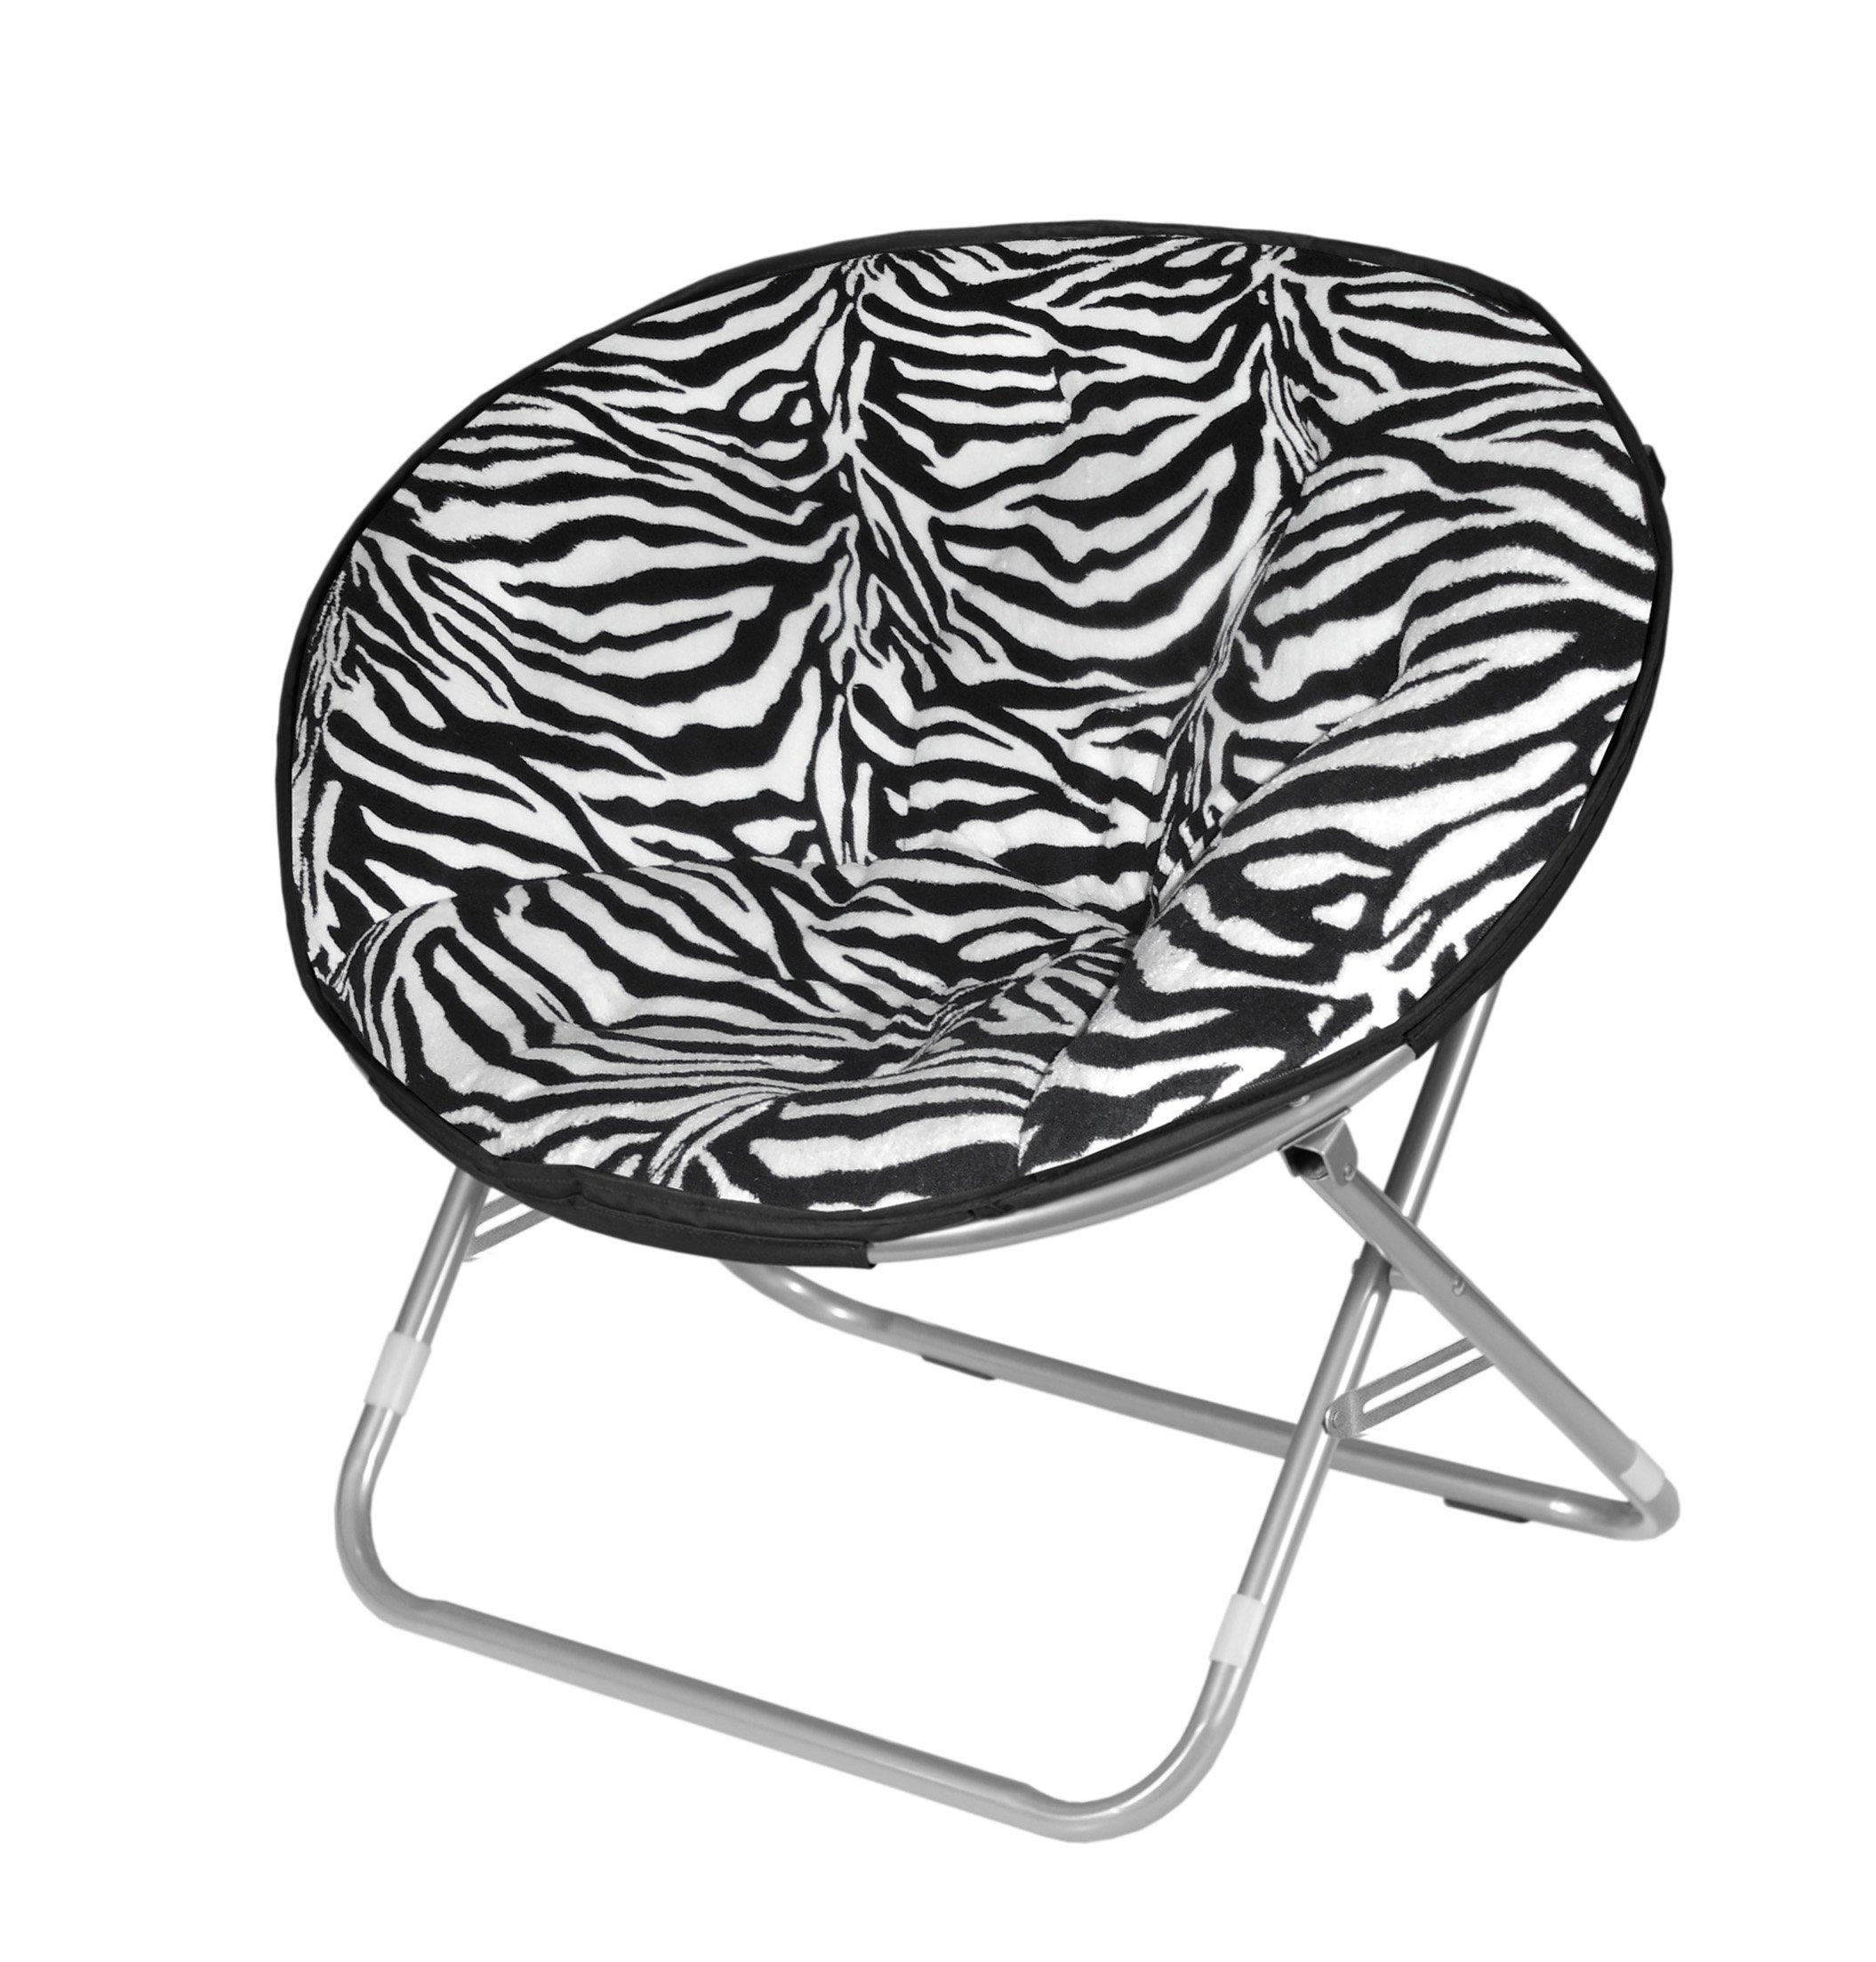 Microplush Folding Saucer Chair Zebra Print FurnitureNdecor